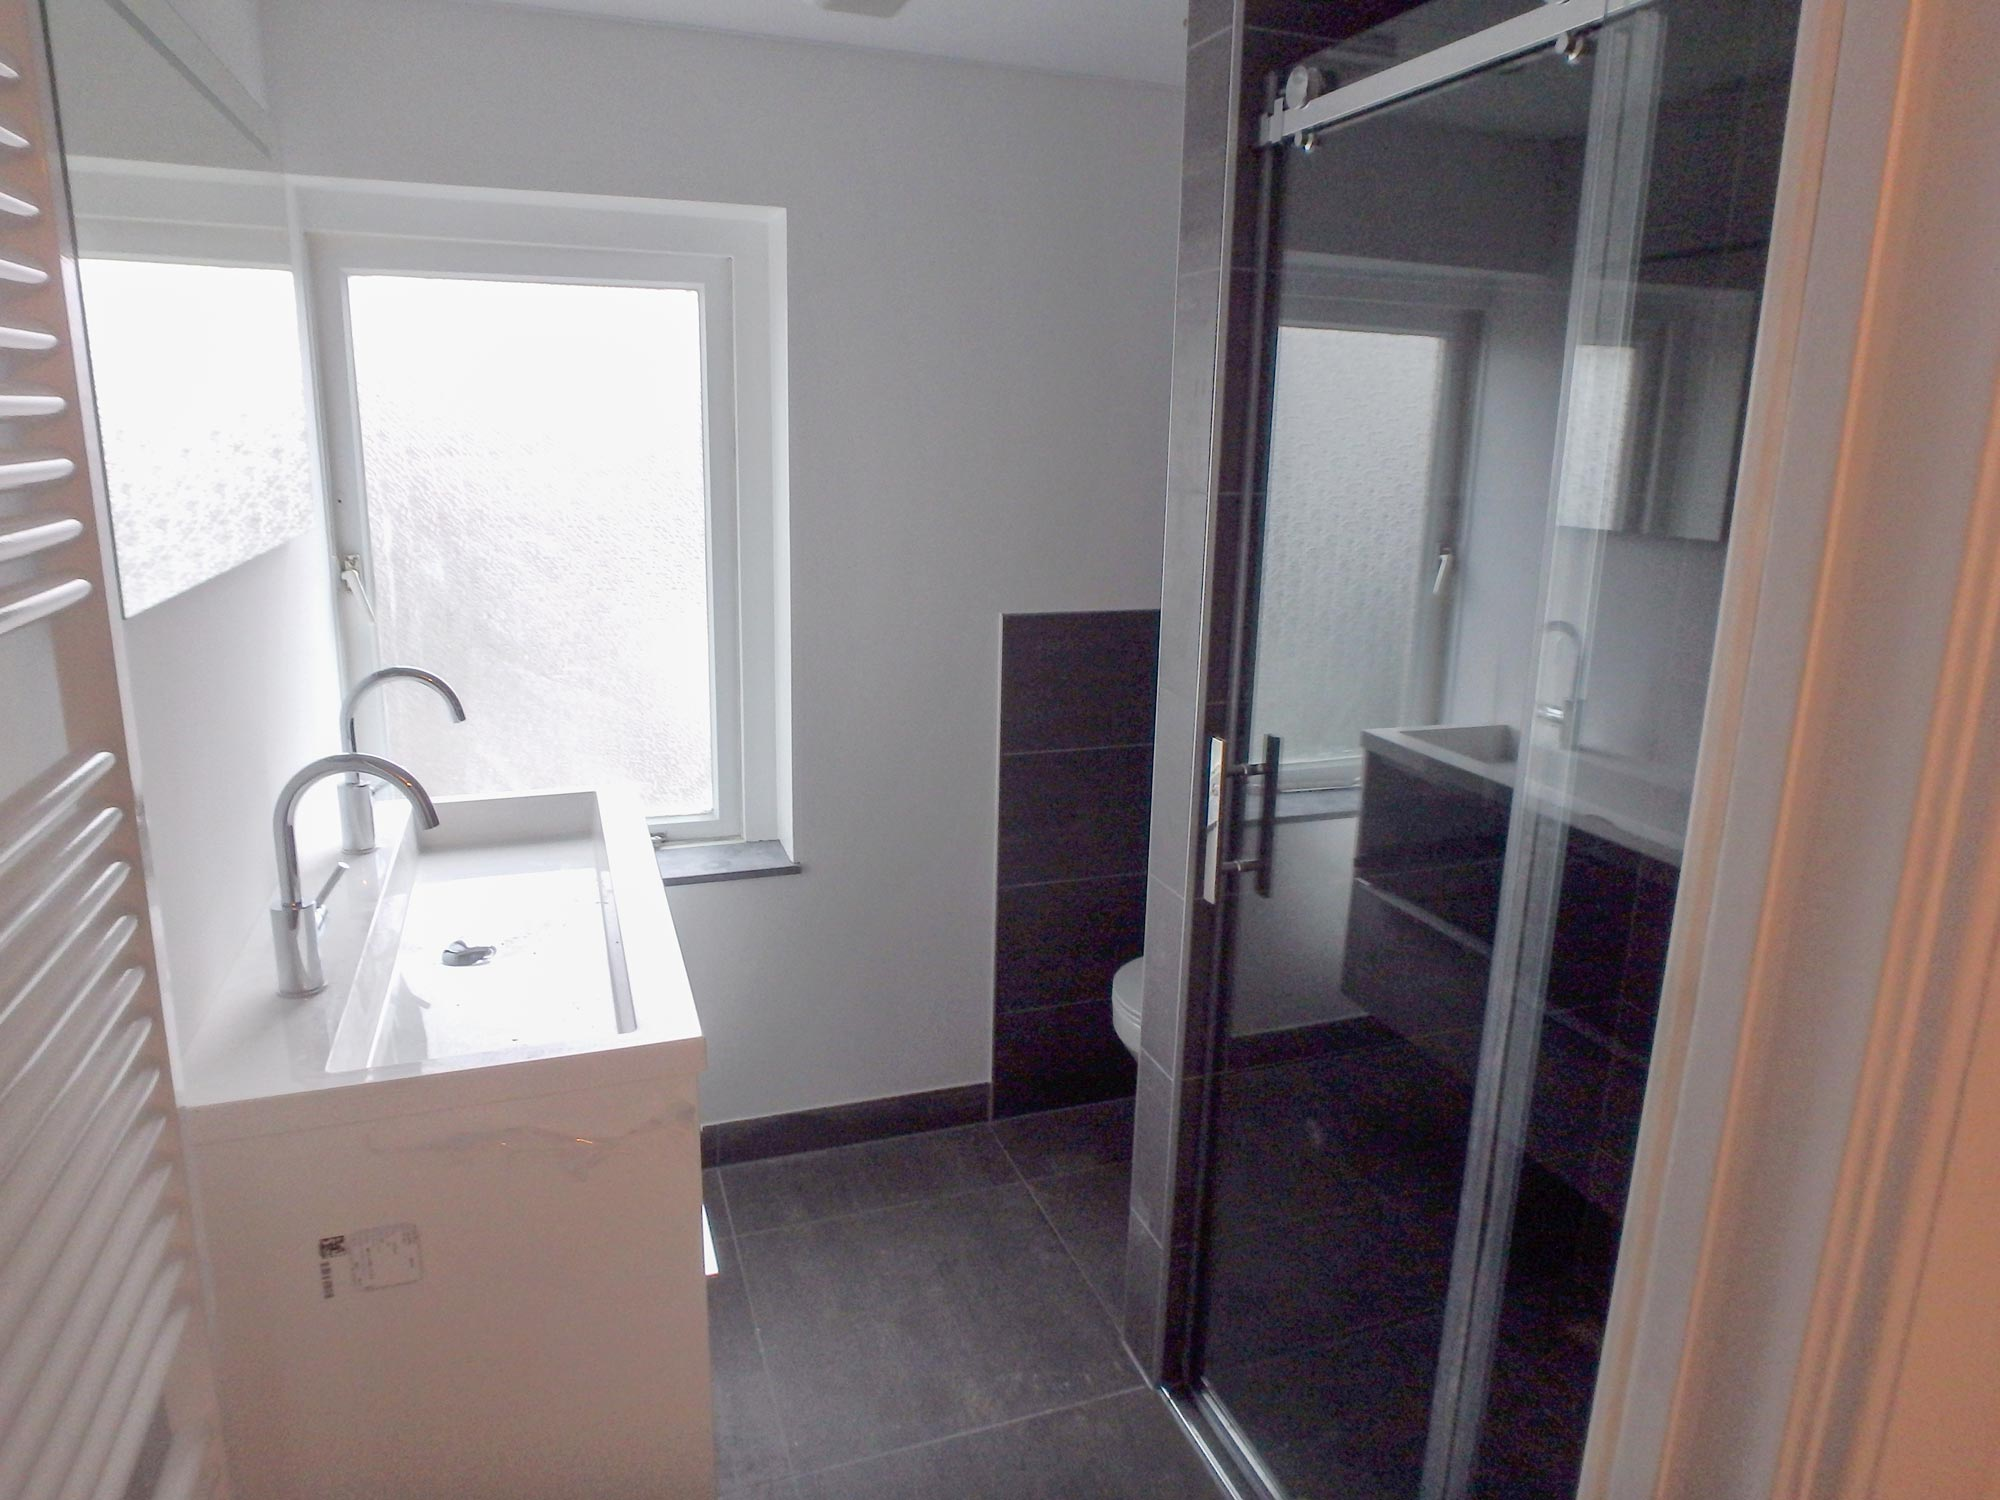 Tiel verbouwing badkamer